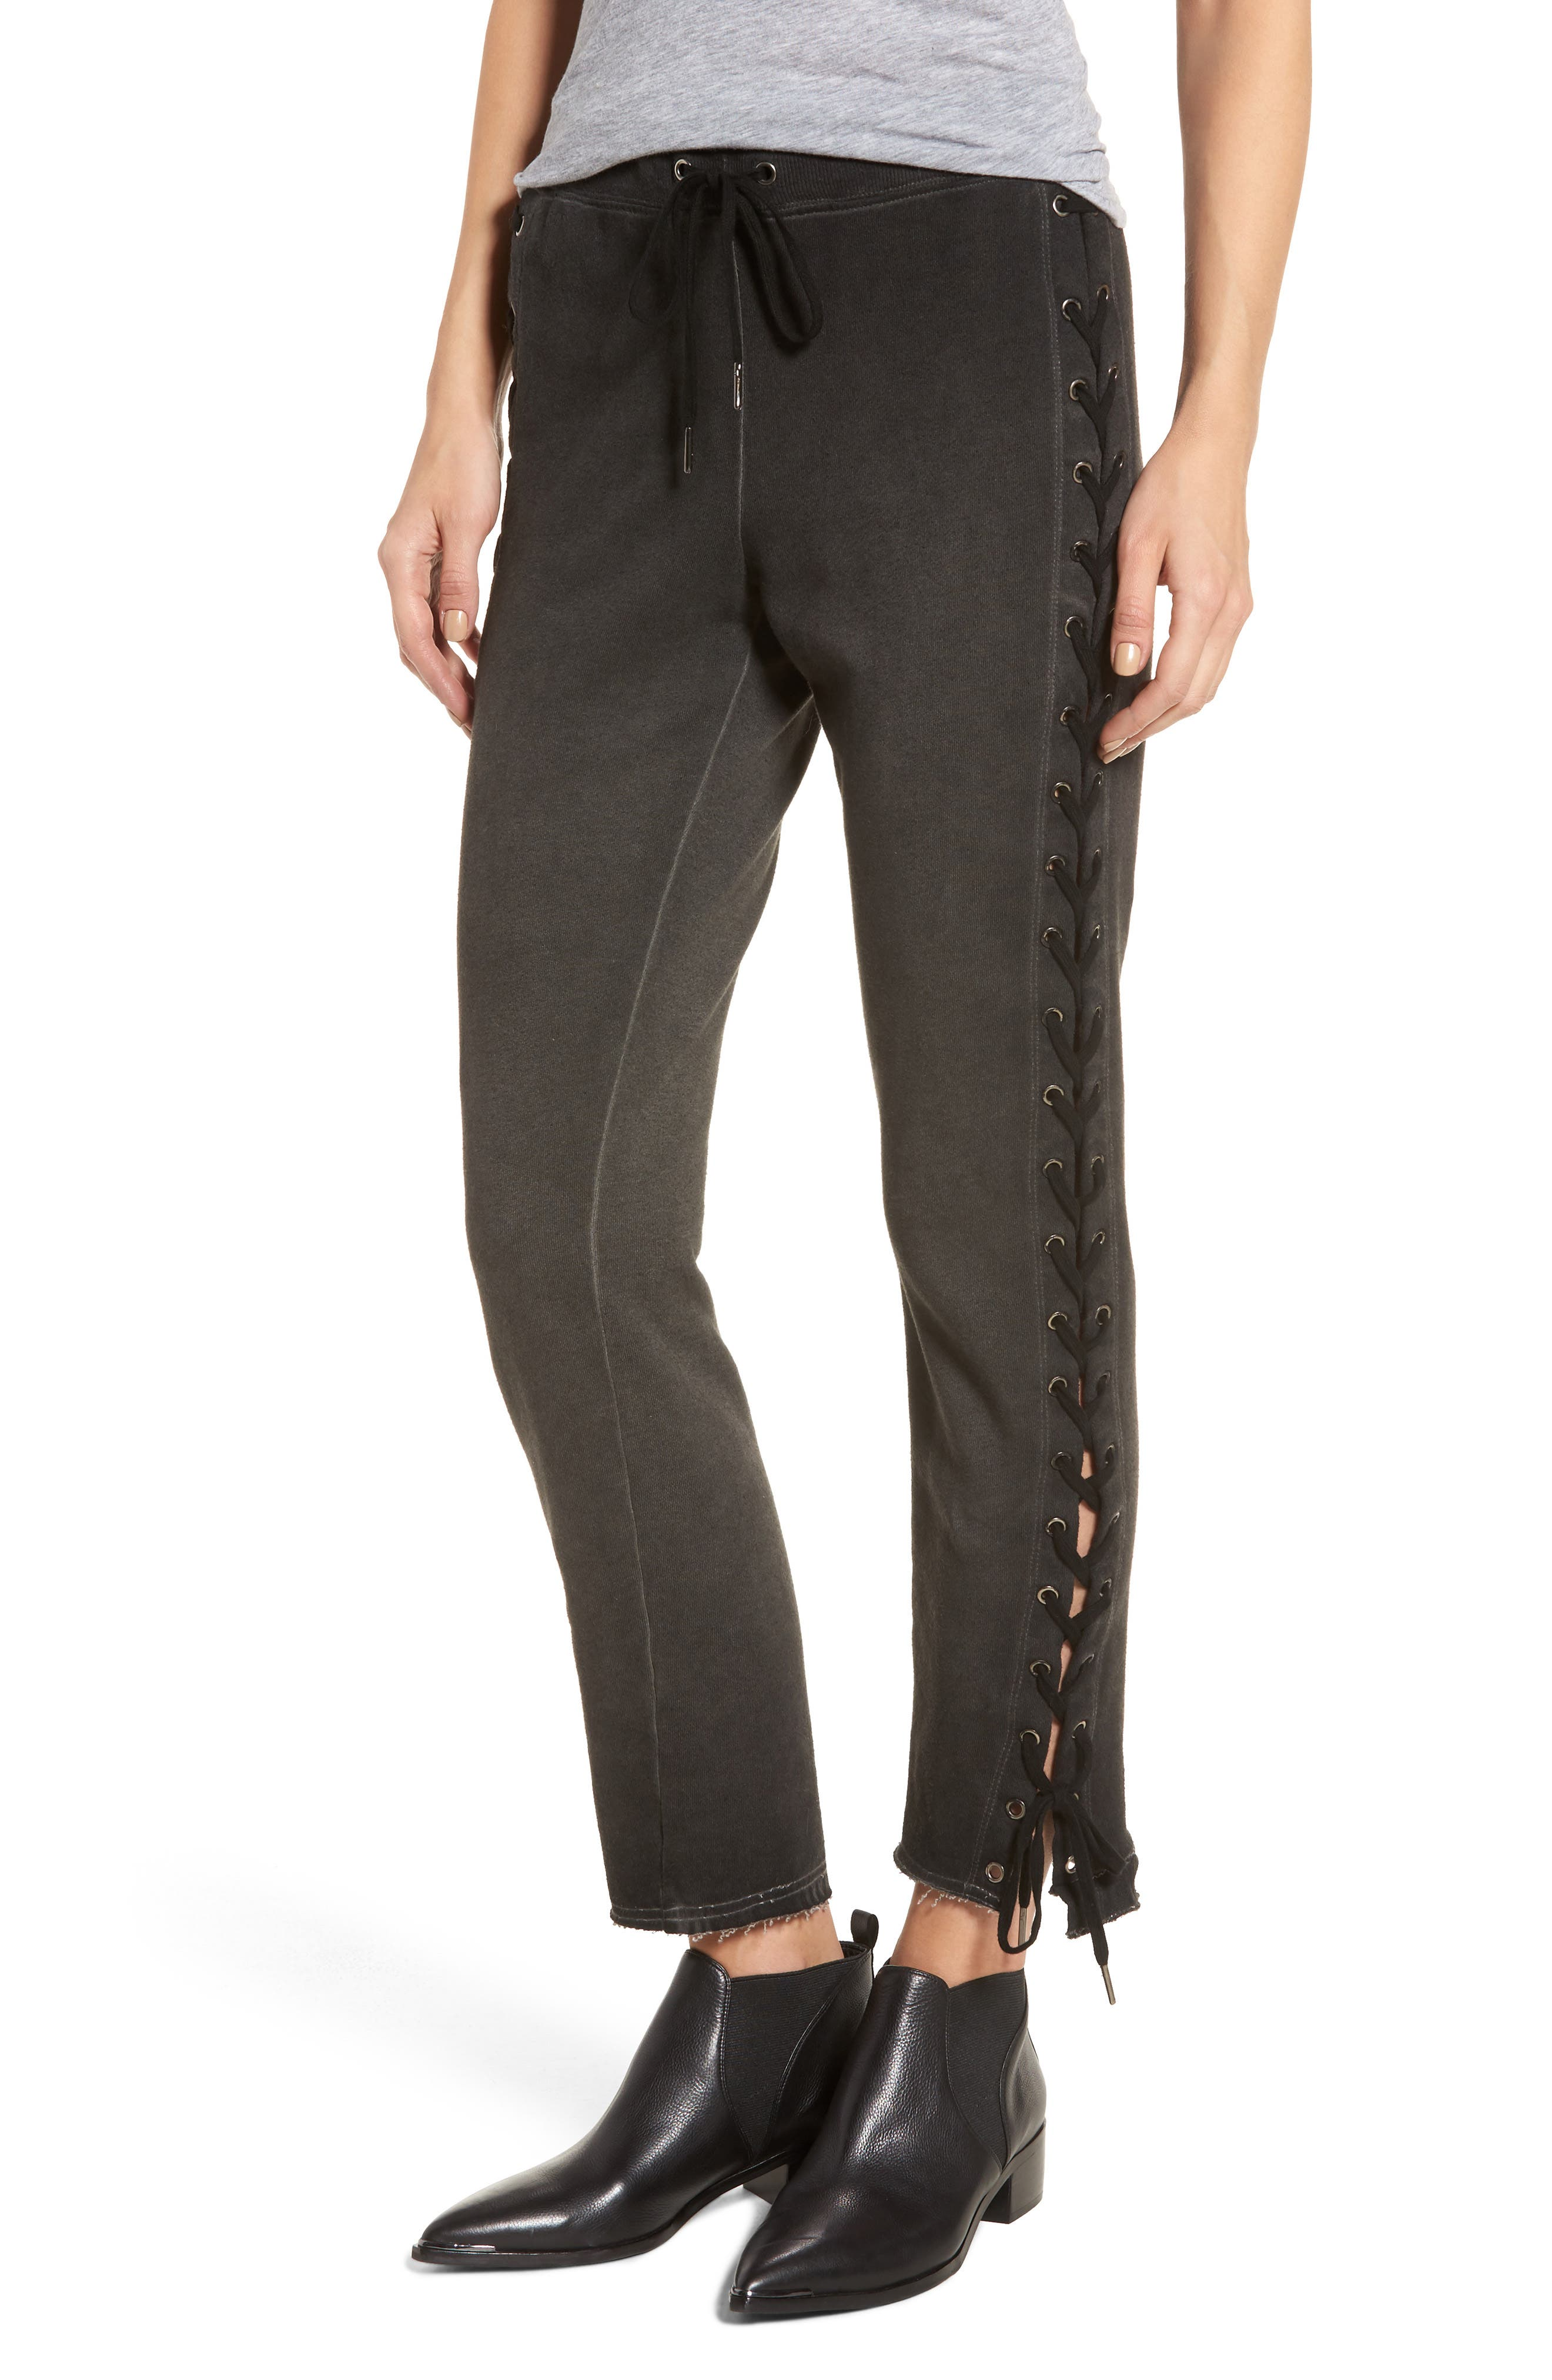 Alternate Image 1 Selected - Pam & Gela Lace-Up Sweatpants